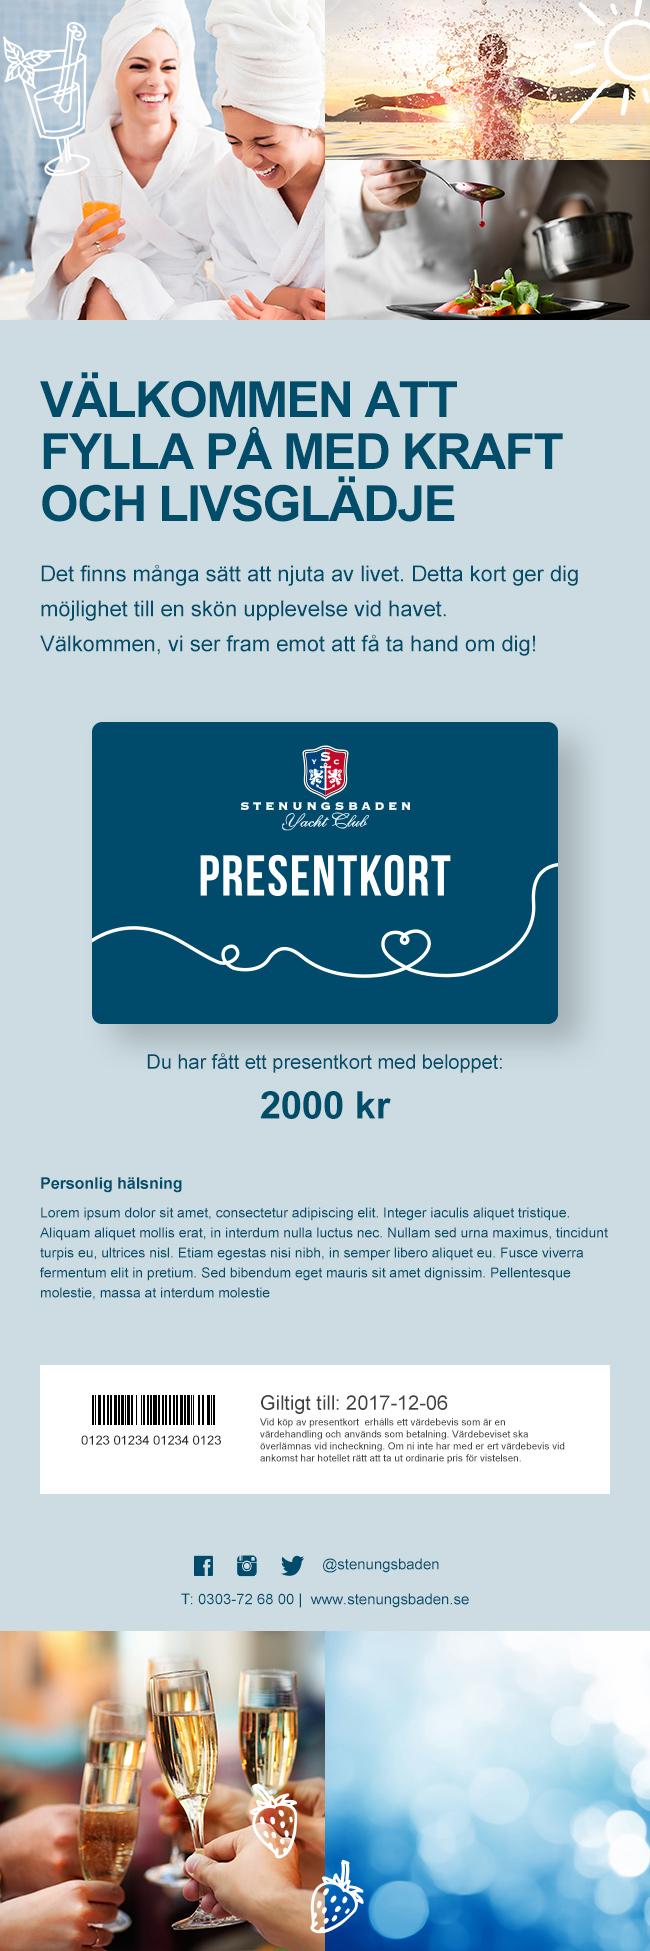 Stenungsbaden-digitalt-presentkort.jpg